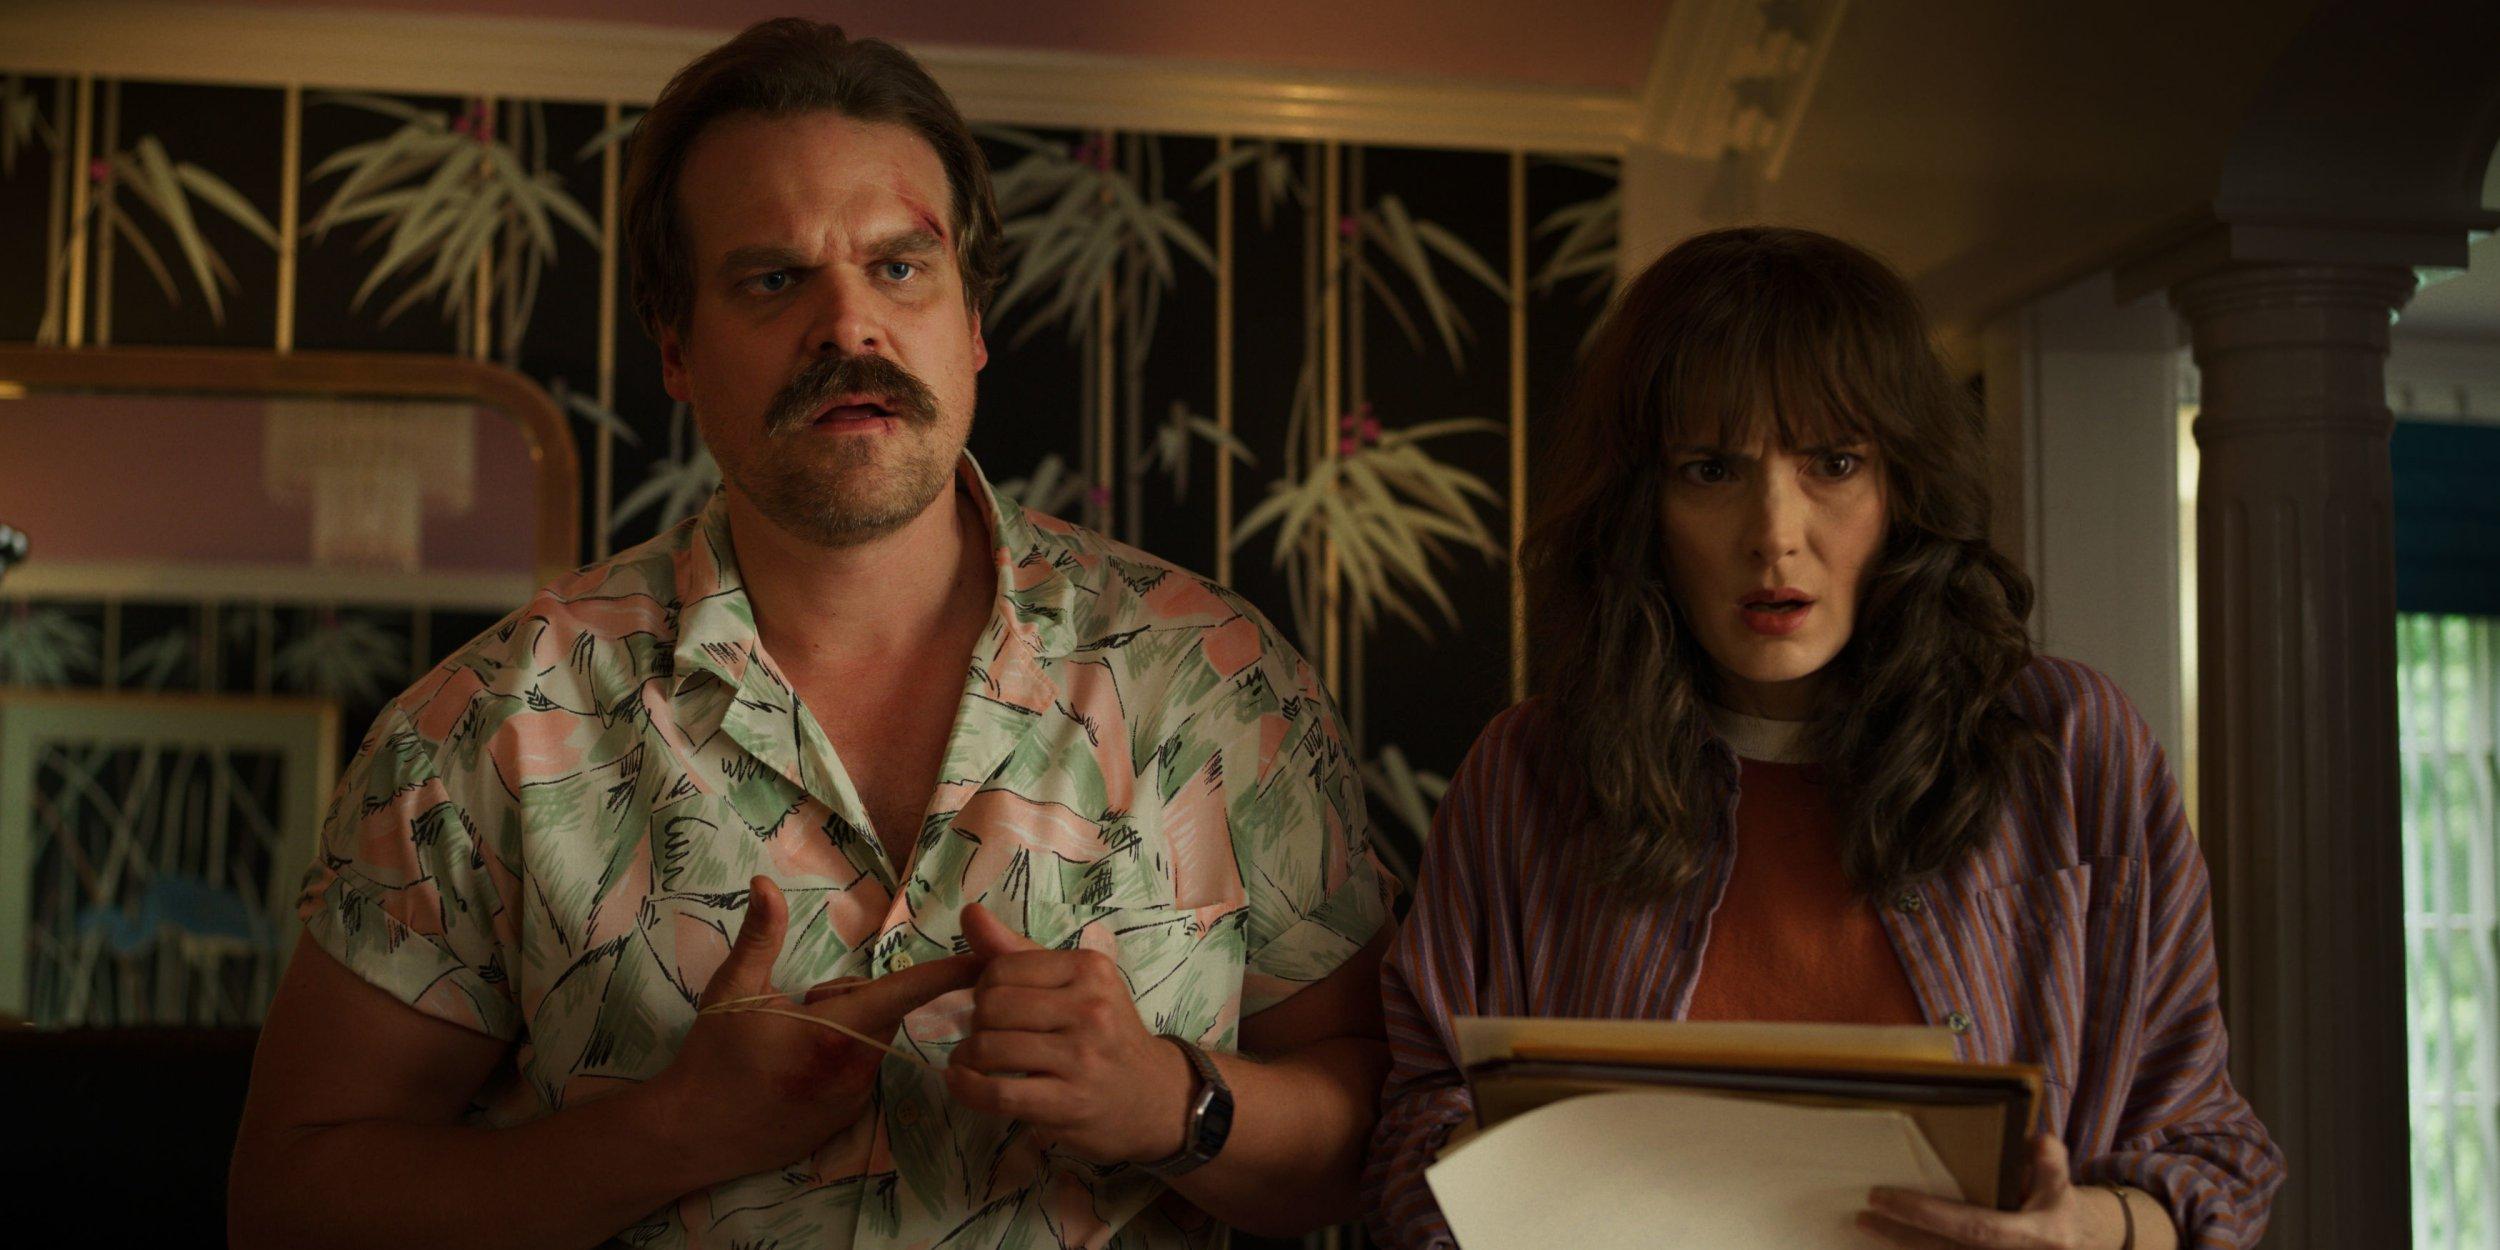 Stranger Things season 3 trailer breakdown: Winona Ryder's exit as Joyce Byers teased as new monster takes over